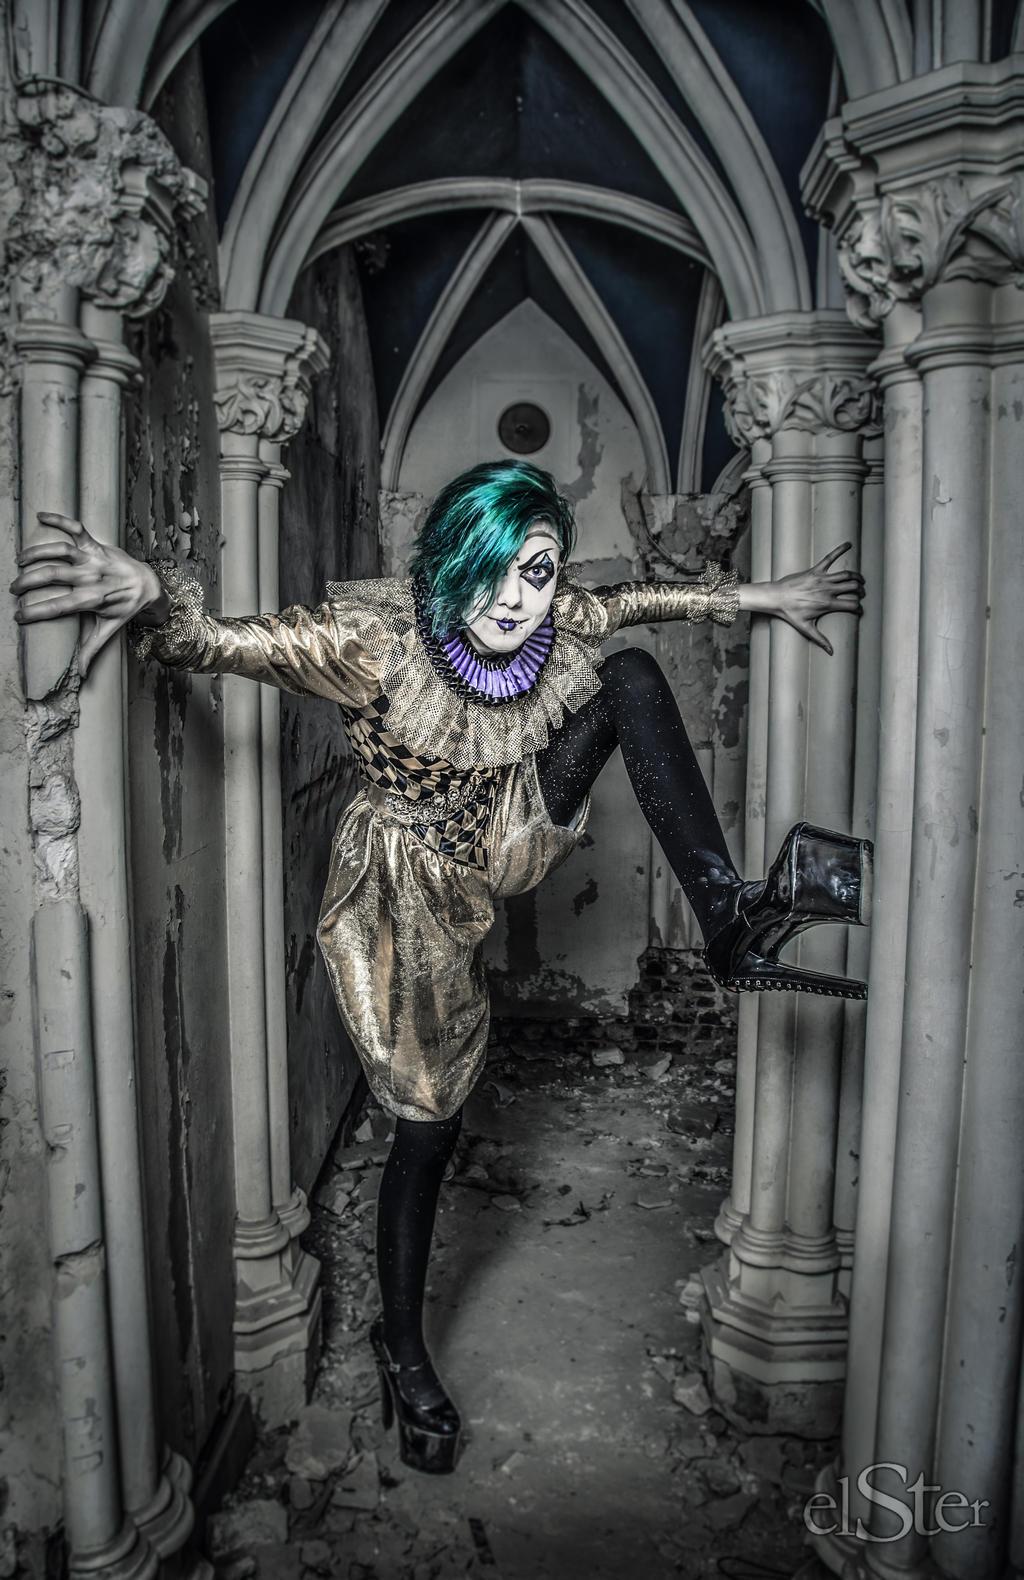 Lost Clown of the Castle.... by DieElster